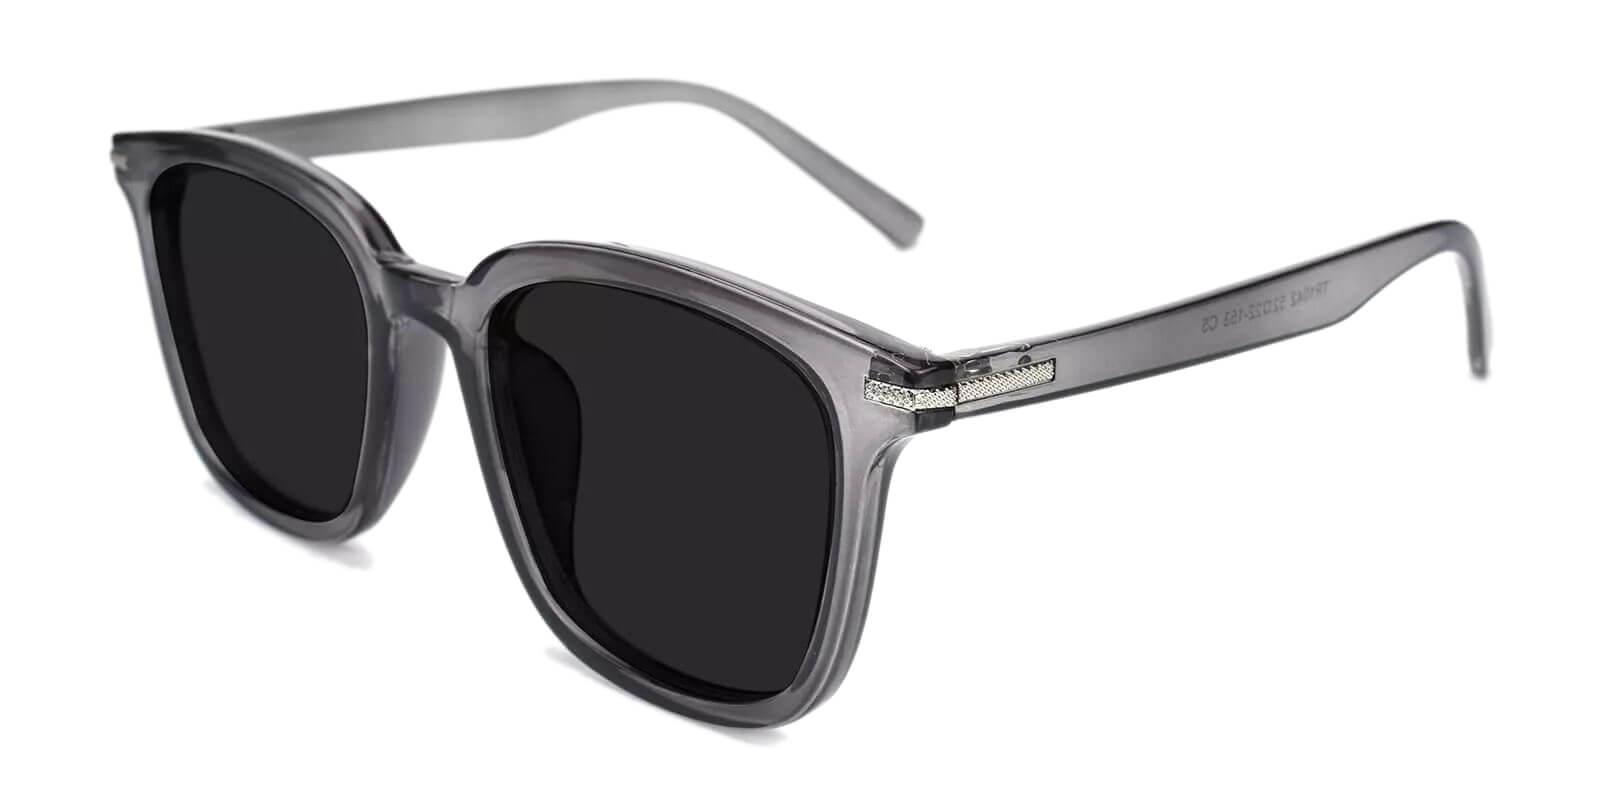 Willow Gray Acetate Fashion , Sunglasses , UniversalBridgeFit Frames from ABBE Glasses